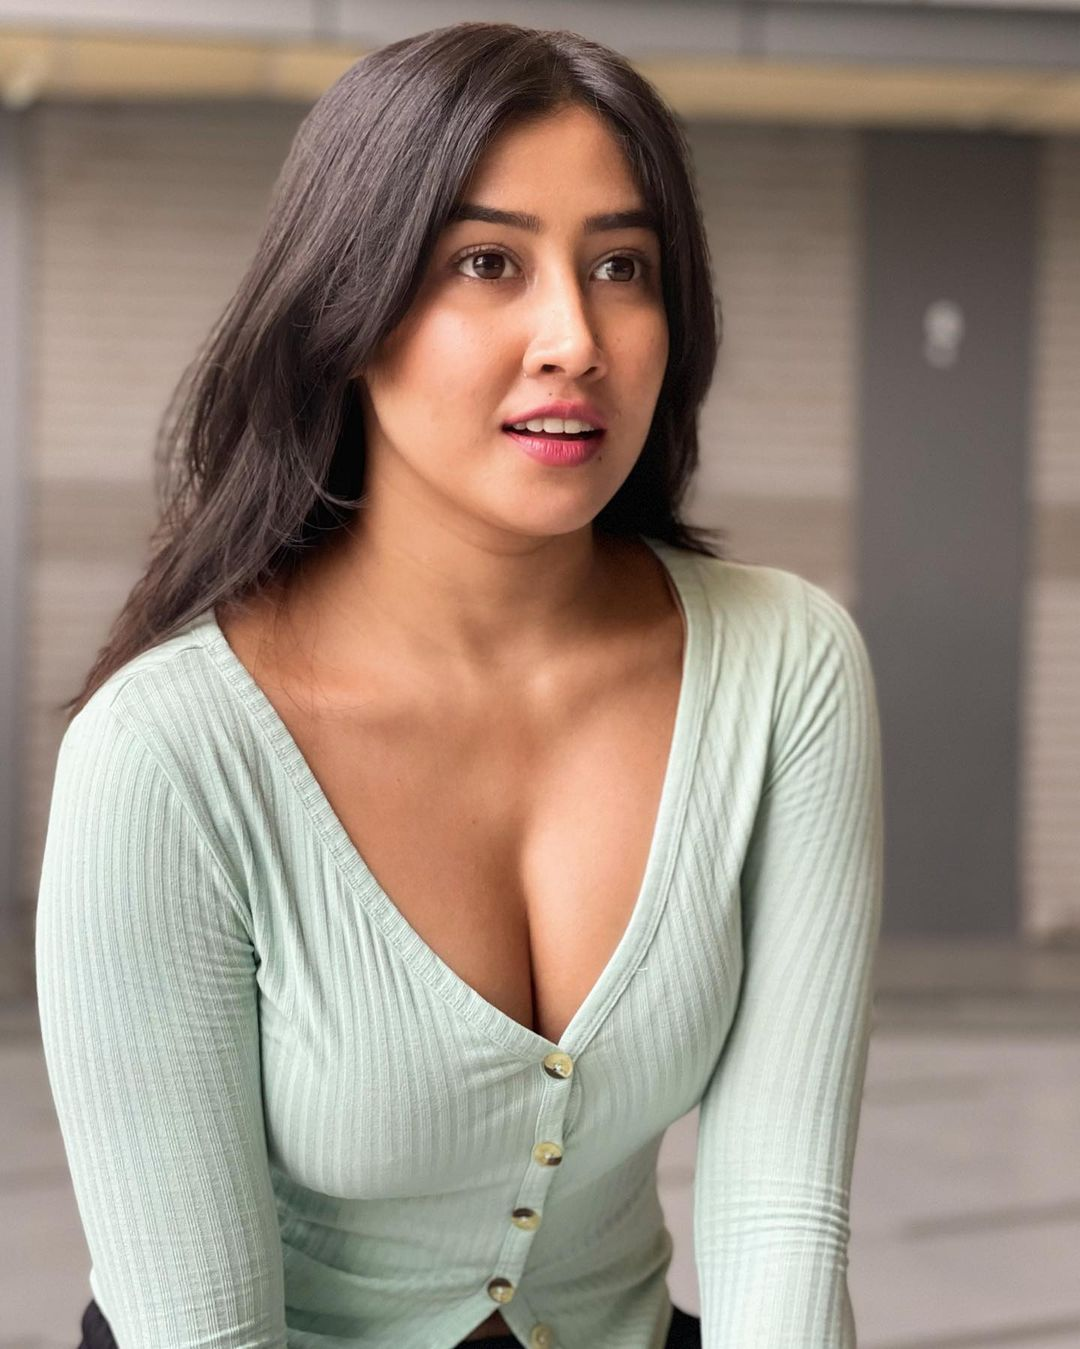 Sofia Ansari - Hot, sexy beautiful Sofia Ansari, Wiki Bio Photos